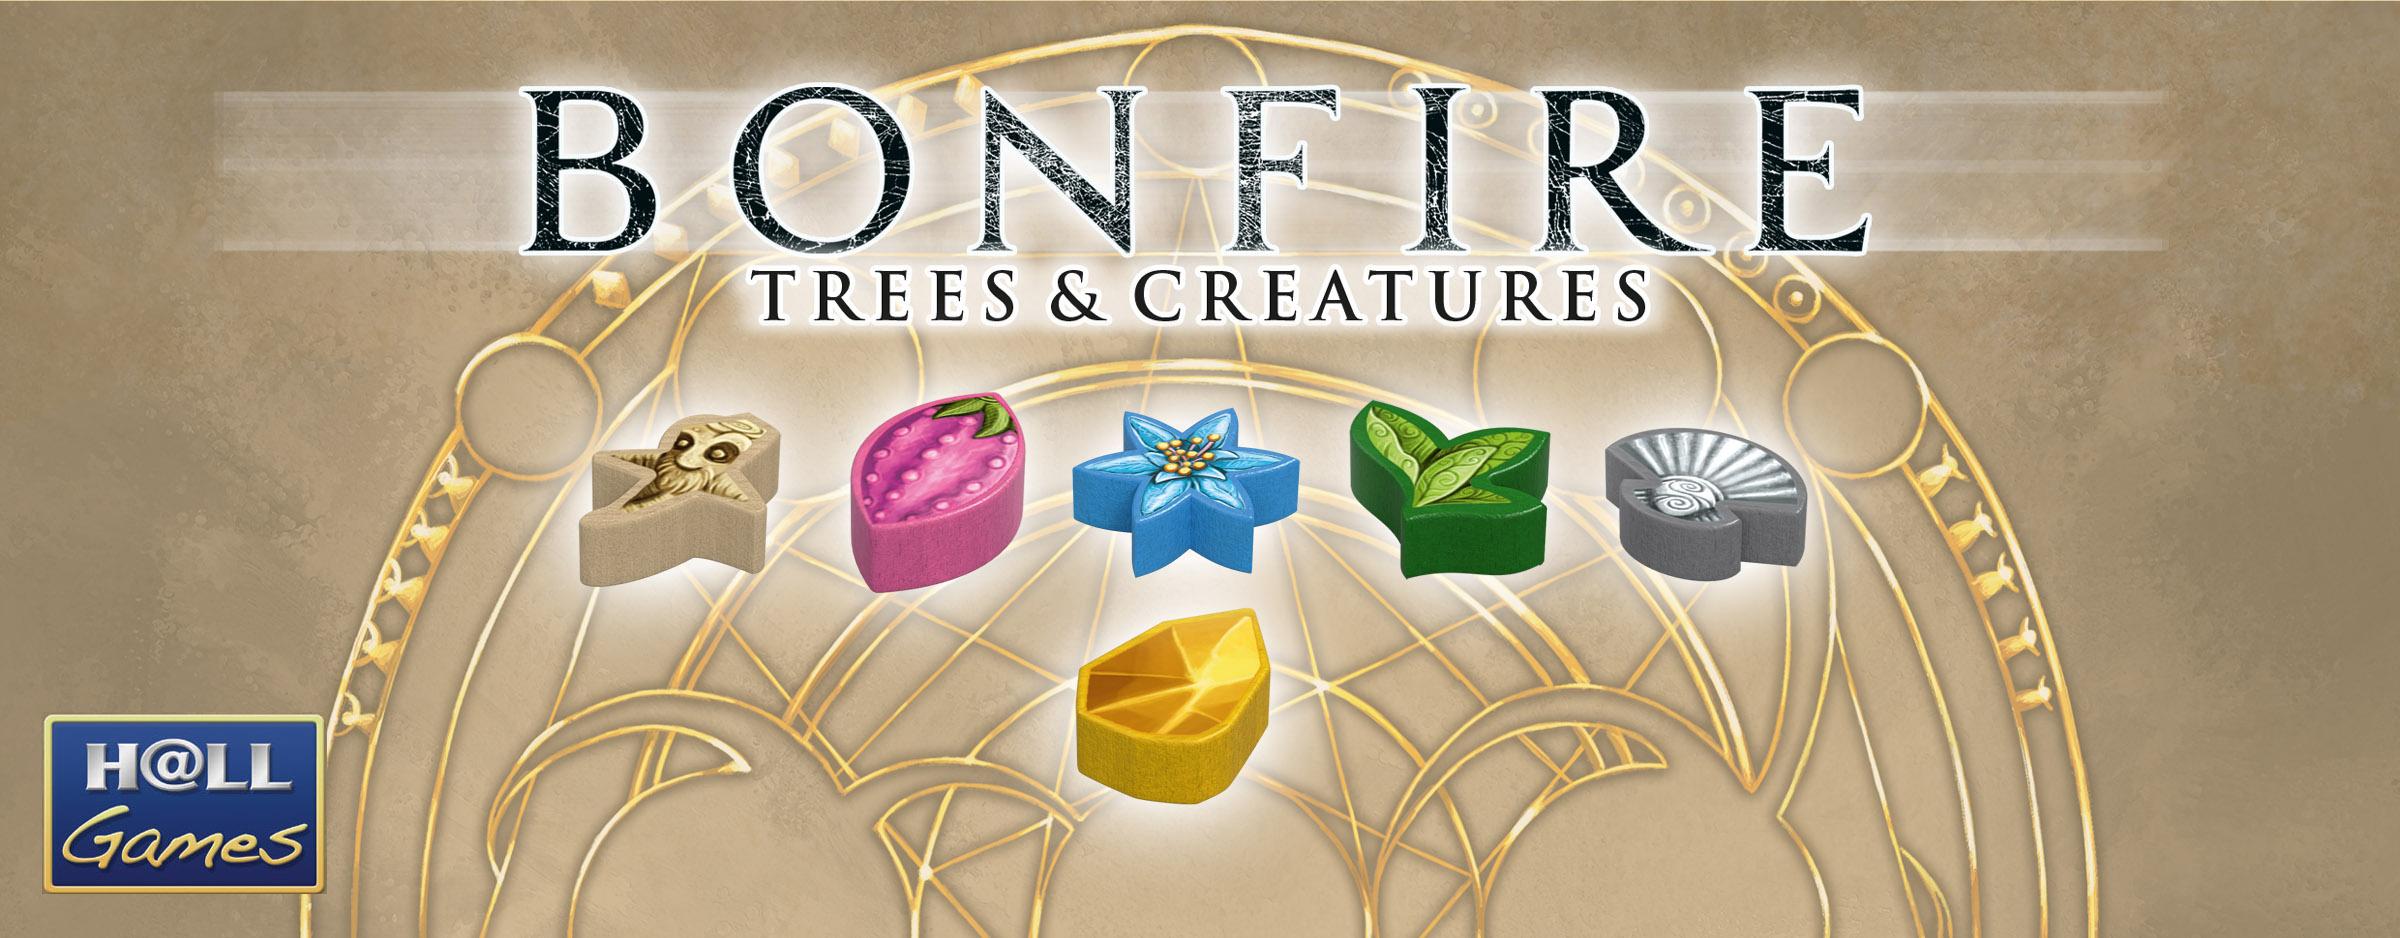 bonfire_treesandcreatures_stickers